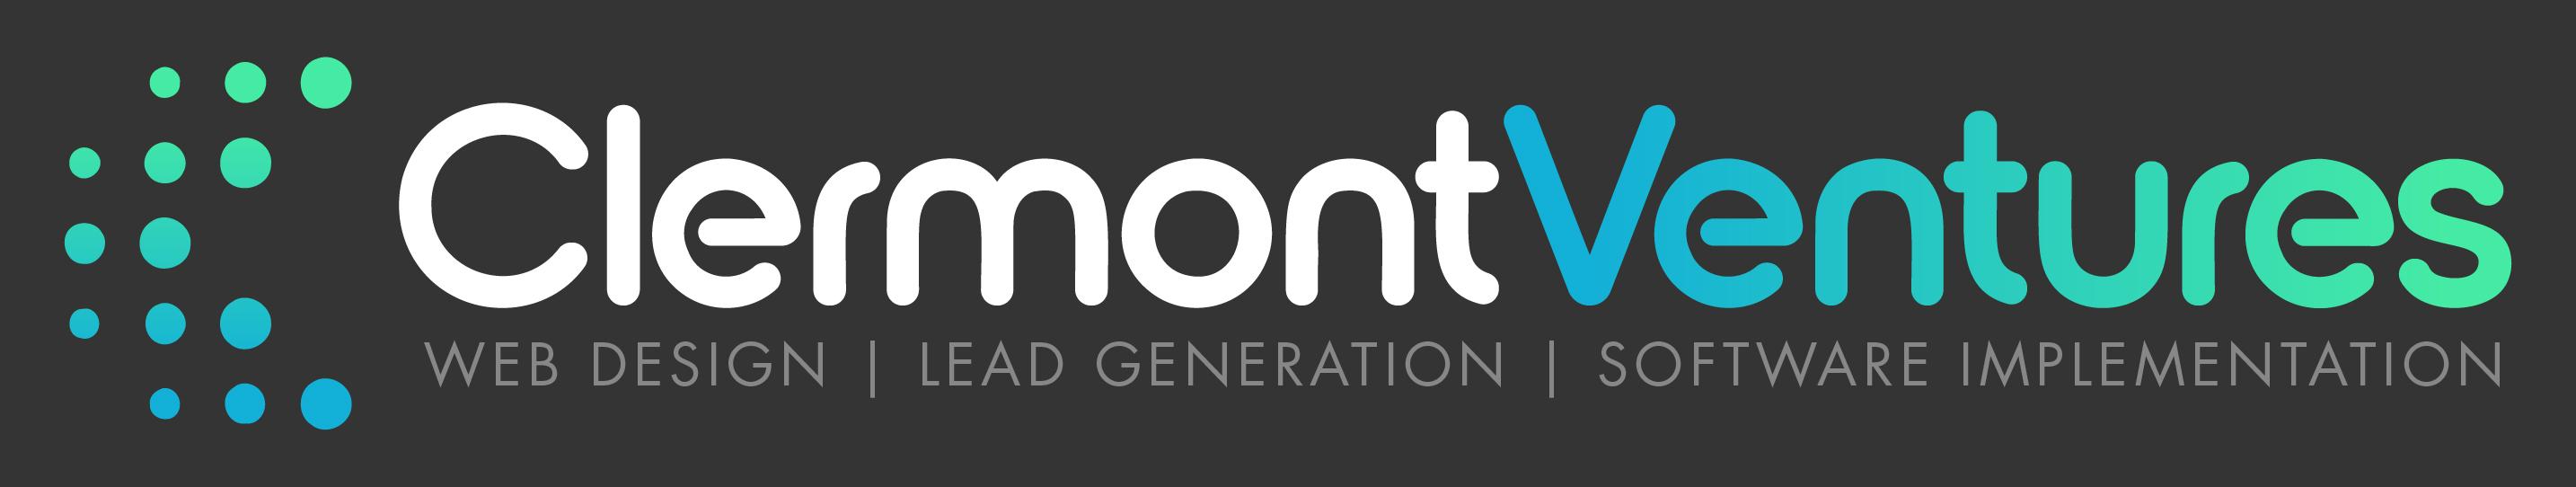 Clermont Ventures logo.jpg